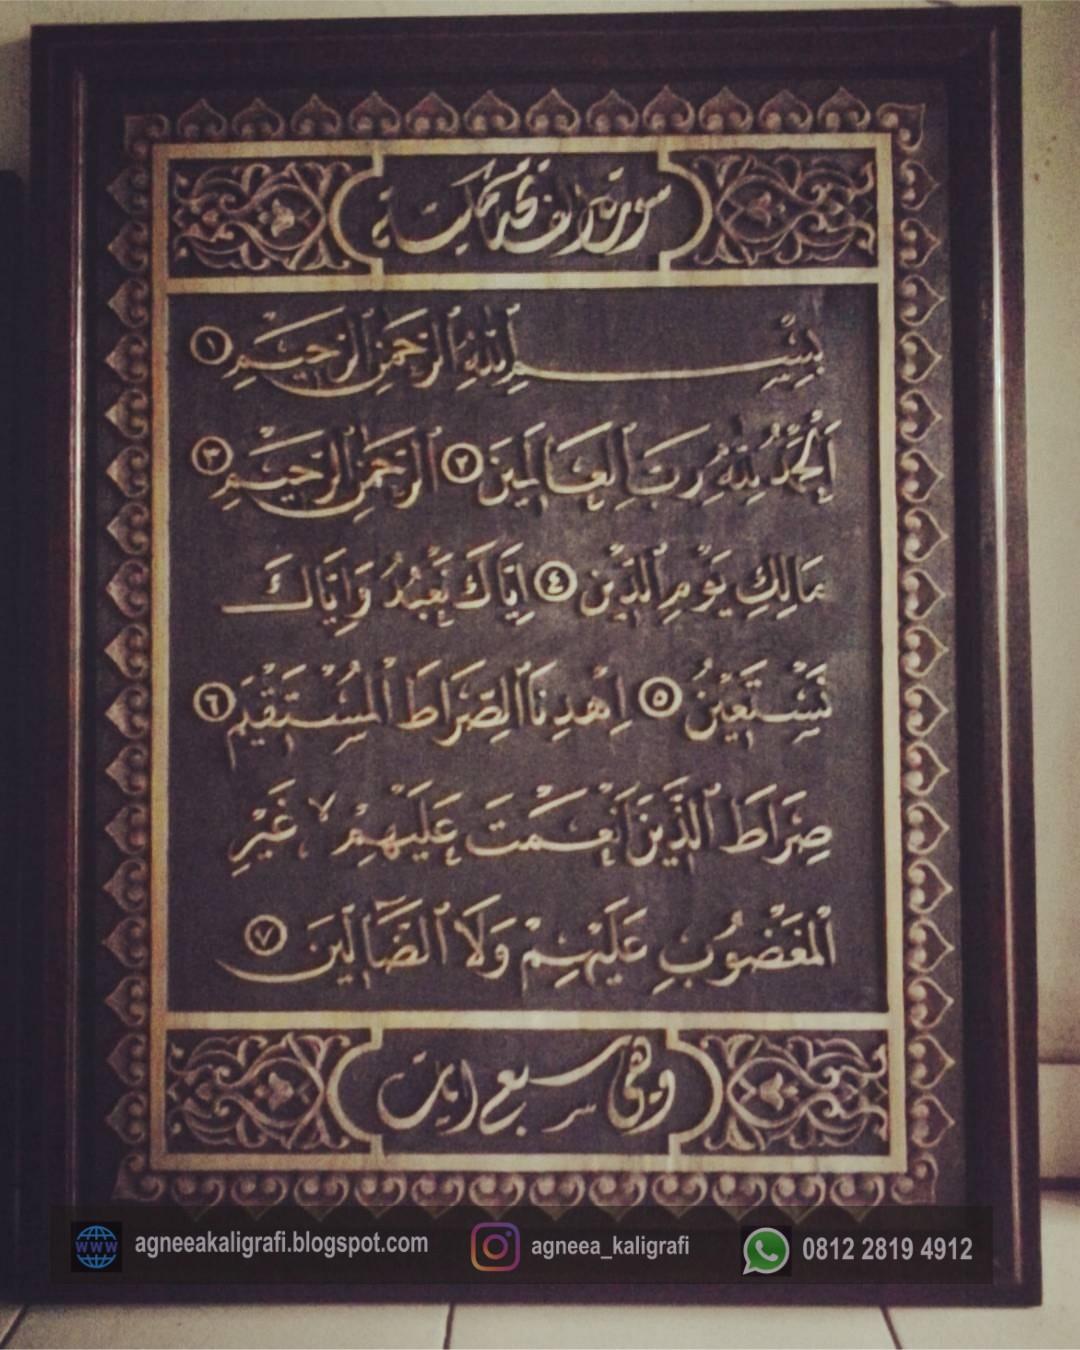 Agneea Kaligrafi Kaligrafi Ukir Surat Al Fatihah